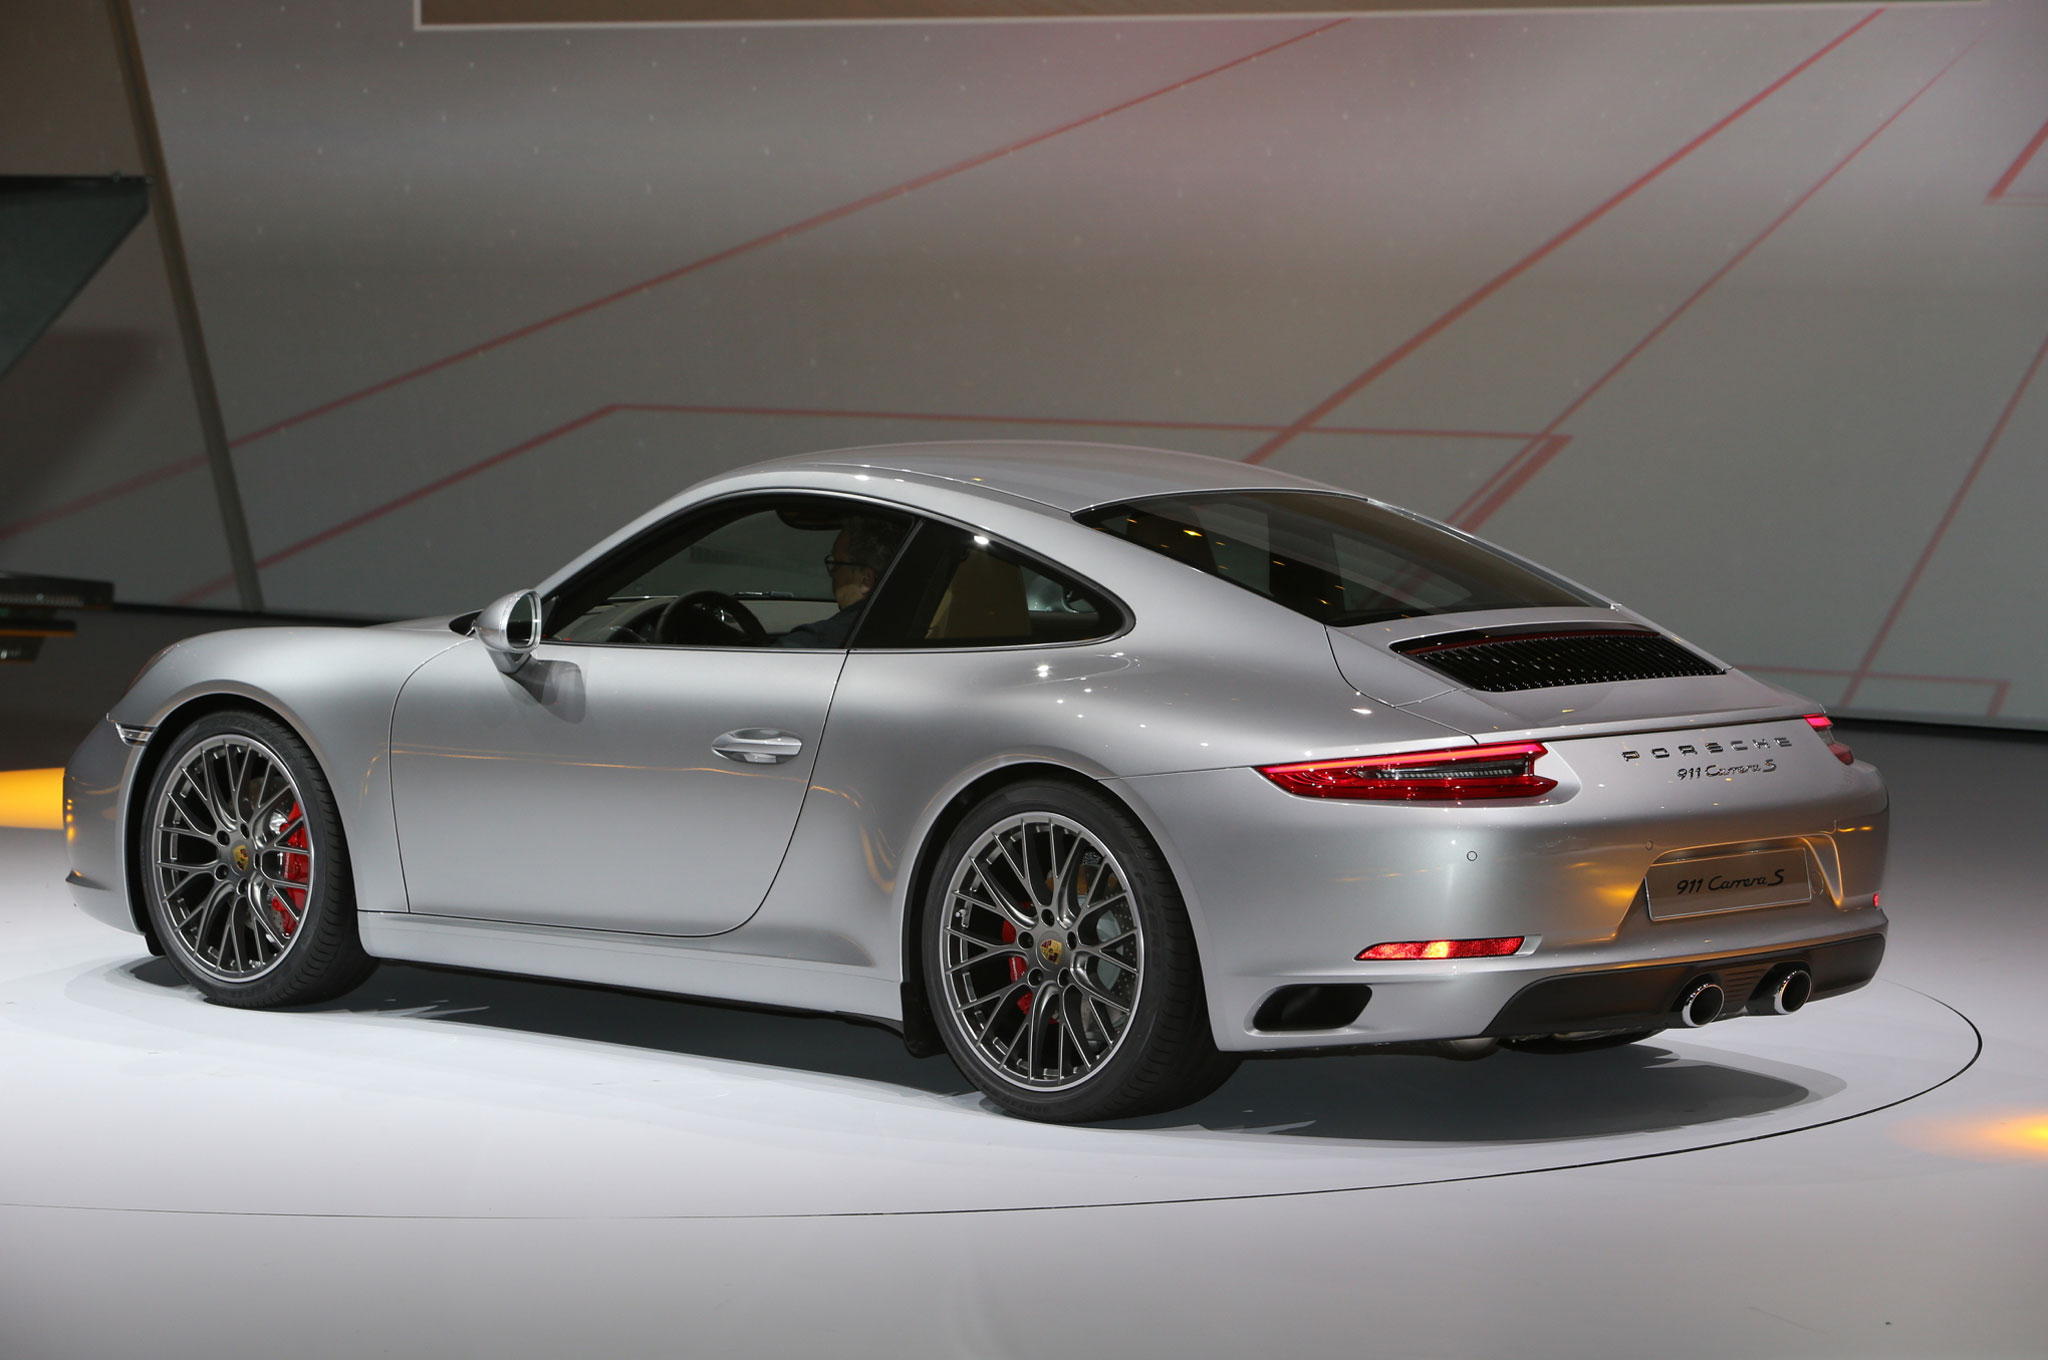 official 2017 porsche 911 carrera carrera s get turbocharged engines. Black Bedroom Furniture Sets. Home Design Ideas